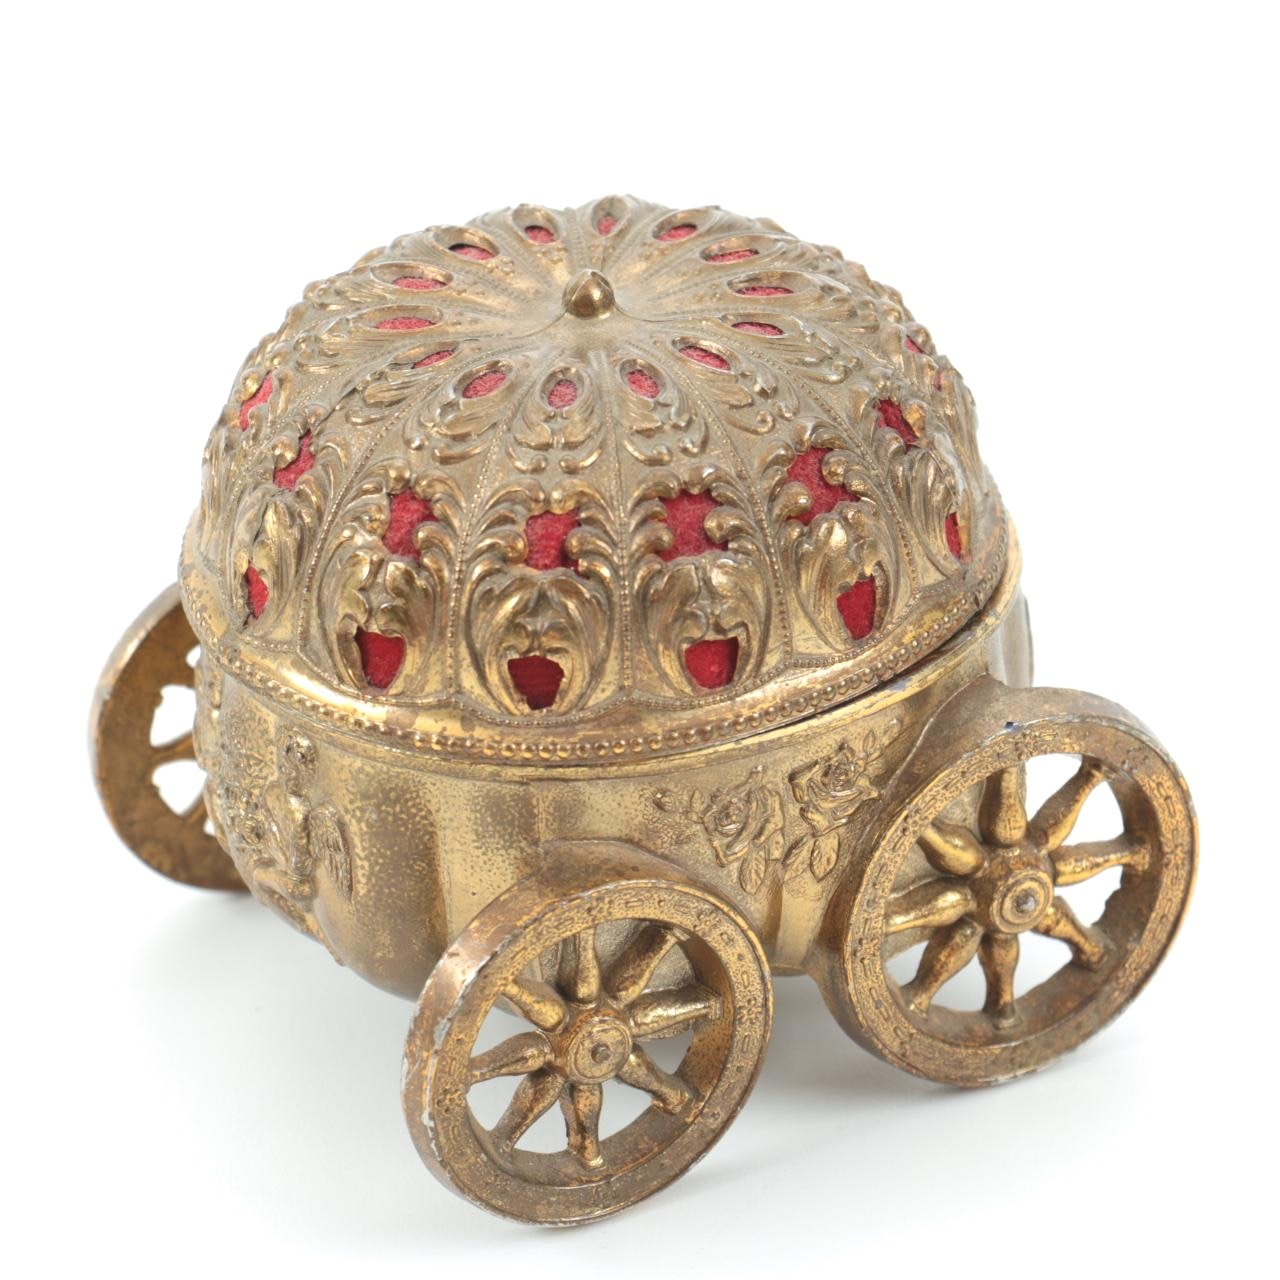 Brass Carriage Music Box